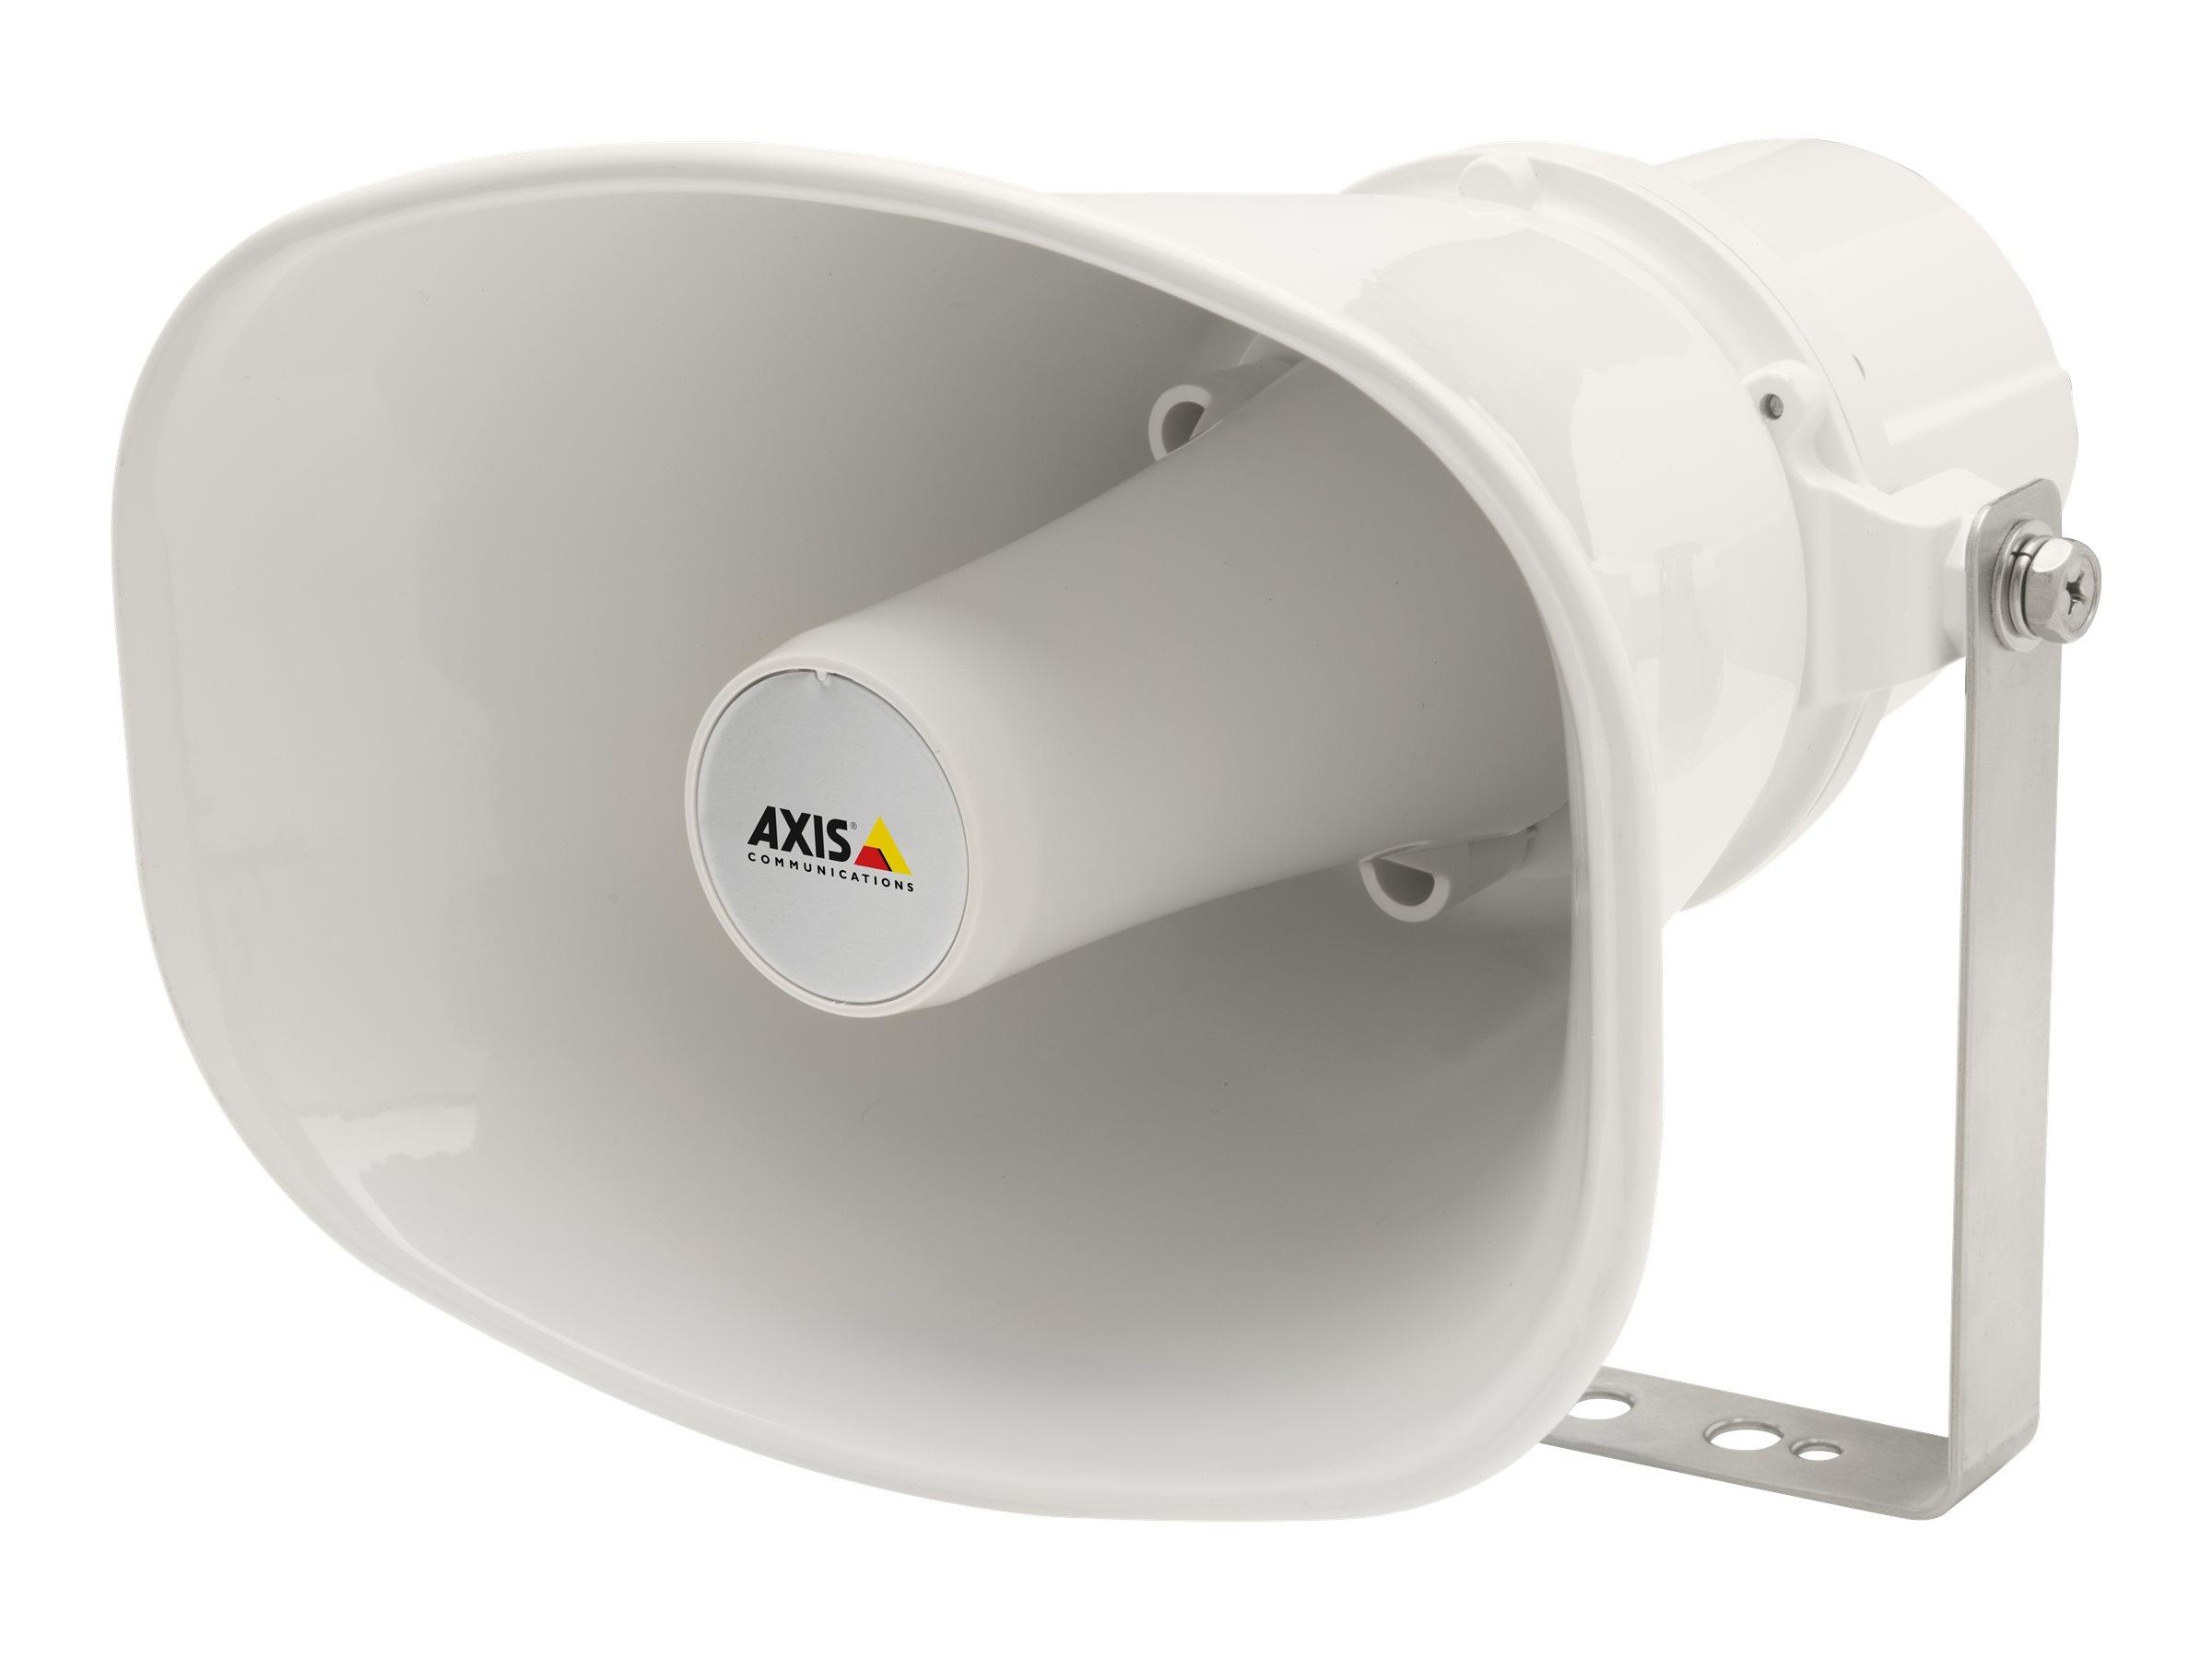 Axis C3003-E Network Horn Speaker - Lautsprecher - für PA-System - Ethernet, Fast Ethernet - 7 Watt